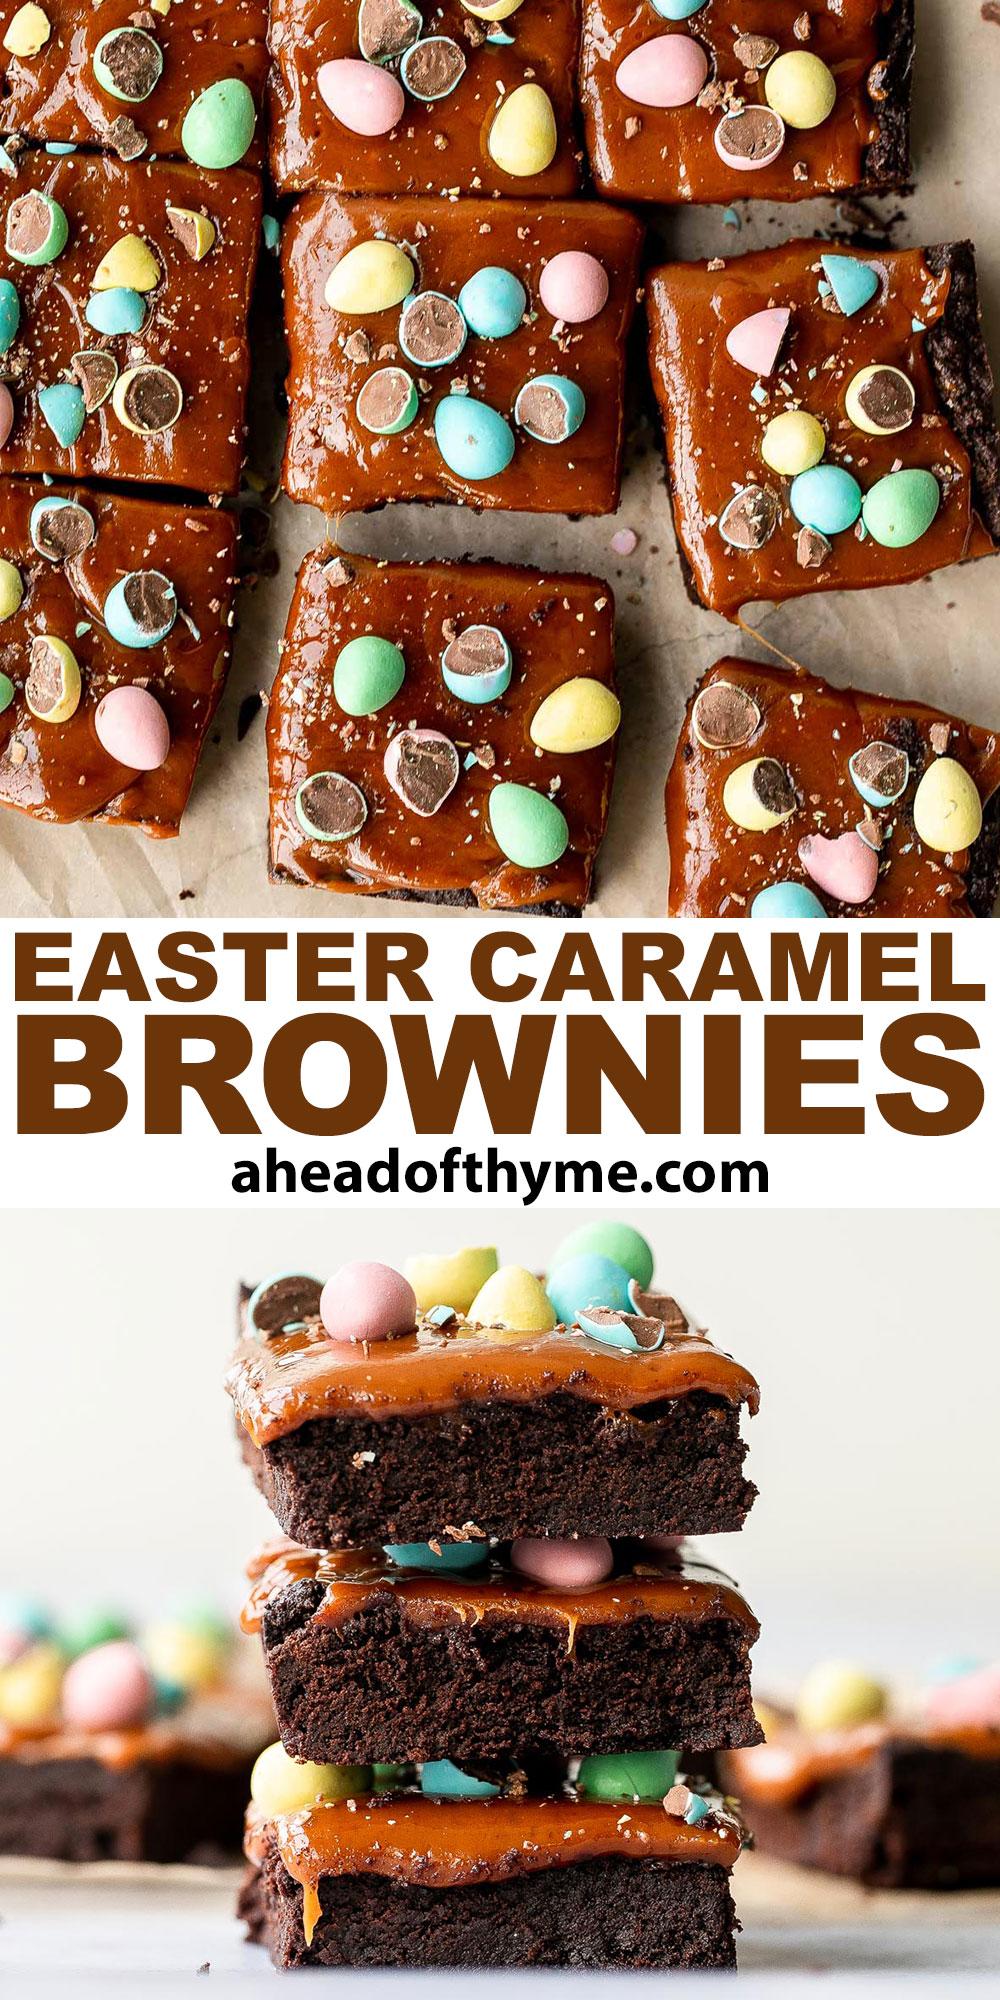 Easter Egg Caramel Brownies